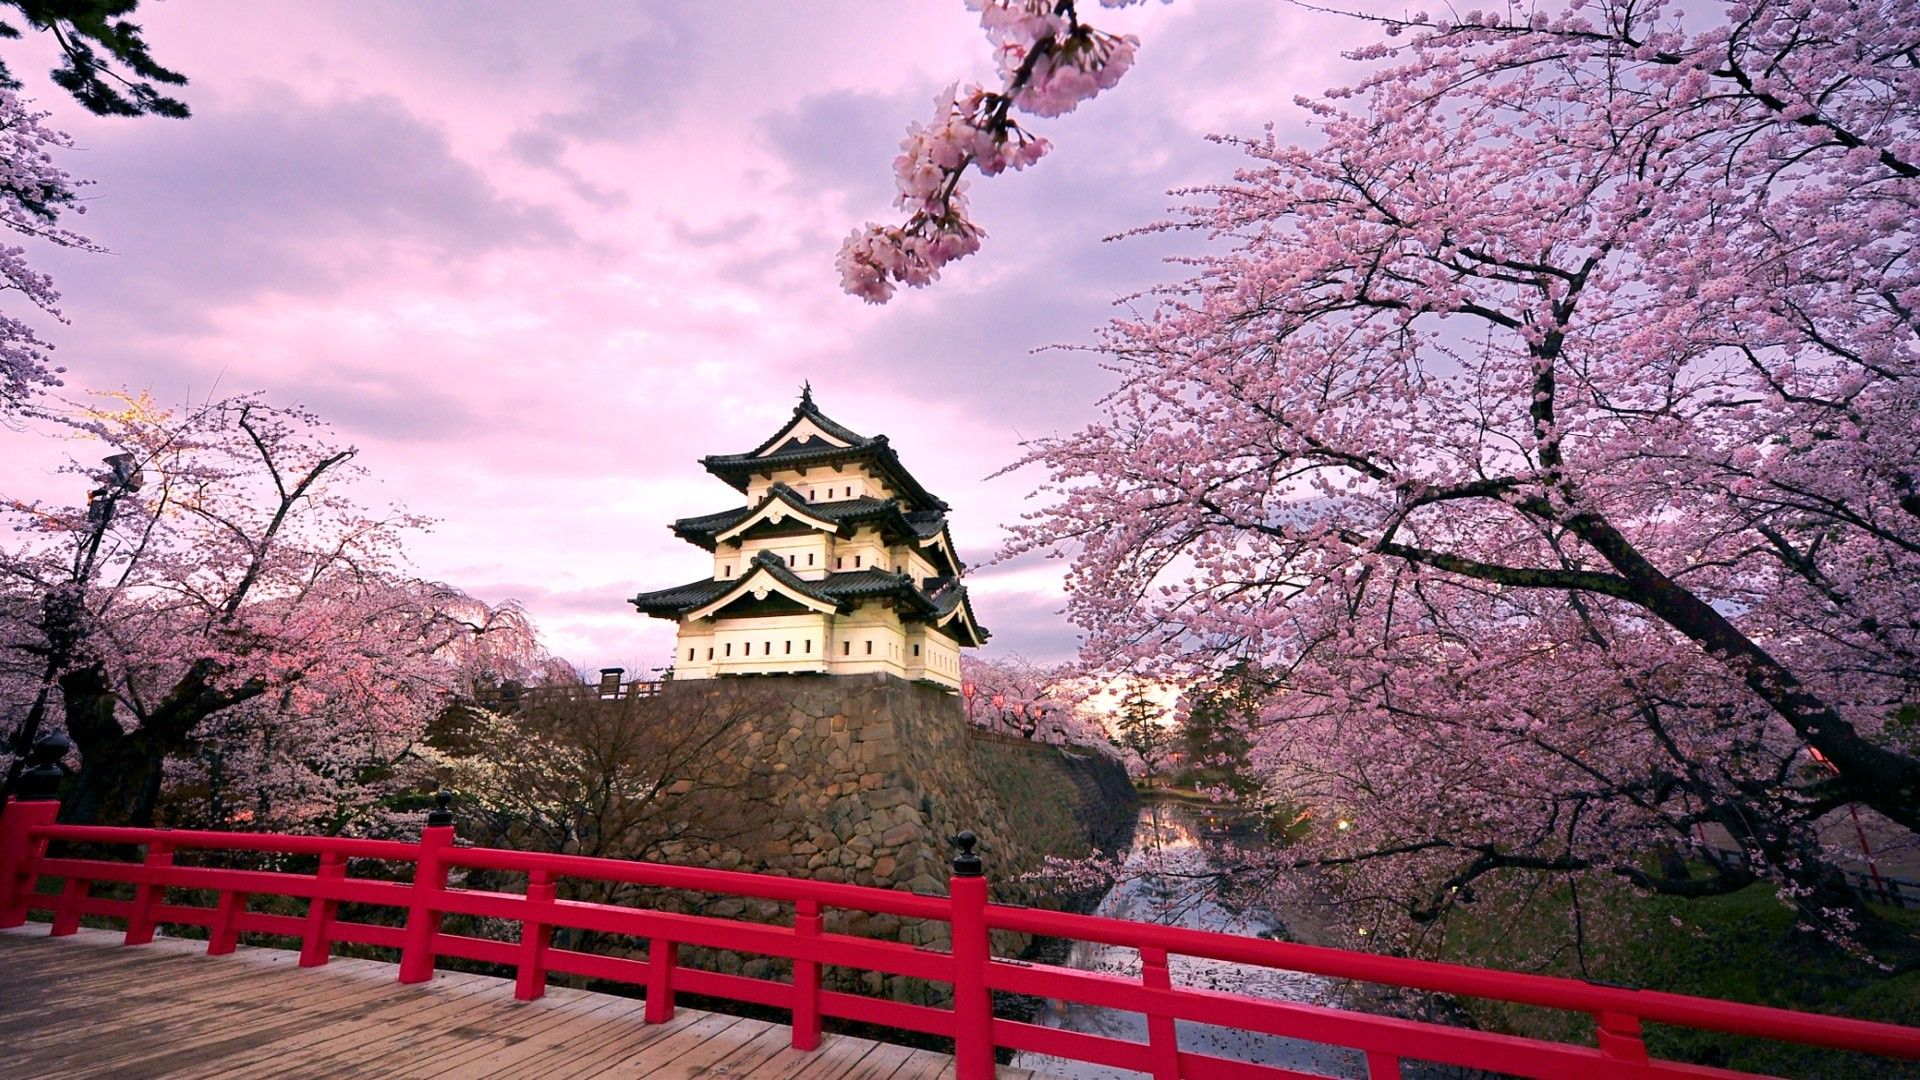 Japanese Cherry Blossom Garden Wallpapers Background For Hd Wallpaper Desktop 1920x 09 Kb